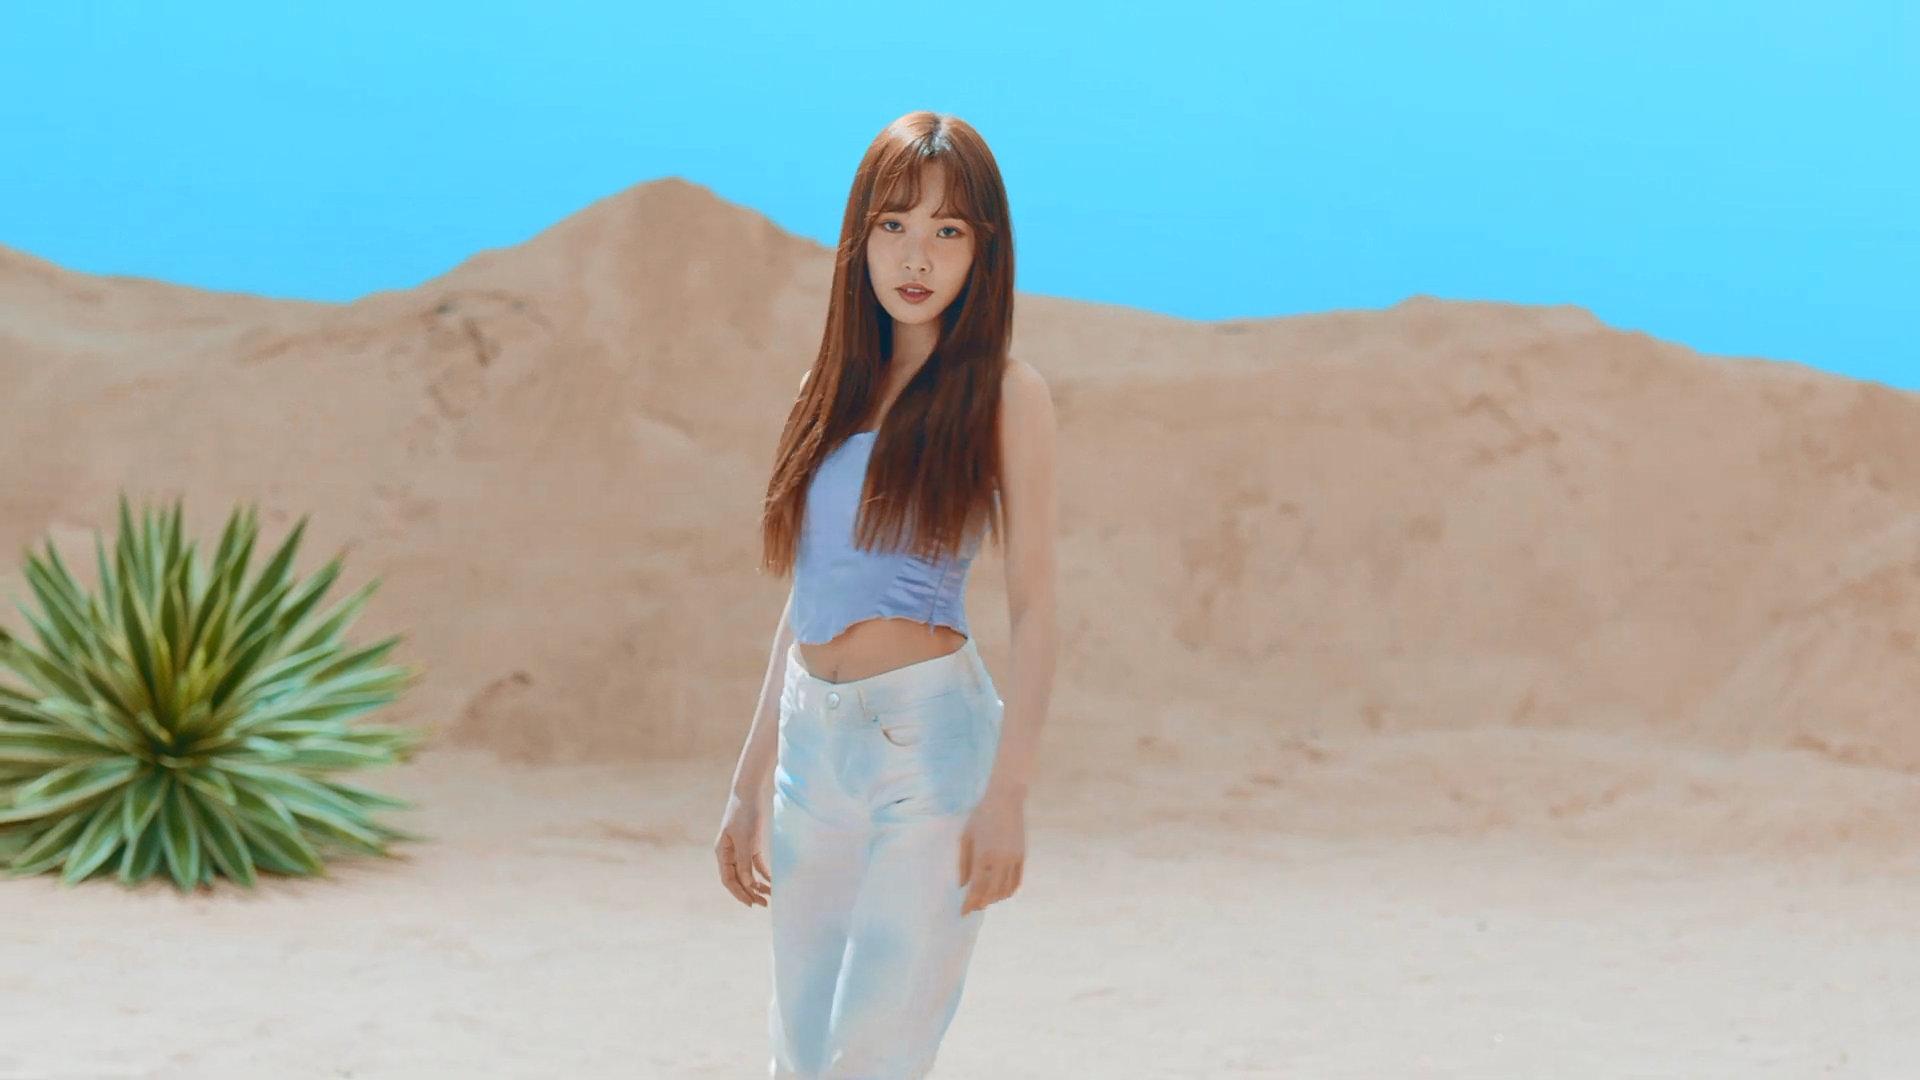 GFRIEND Yuju Fever Teaser